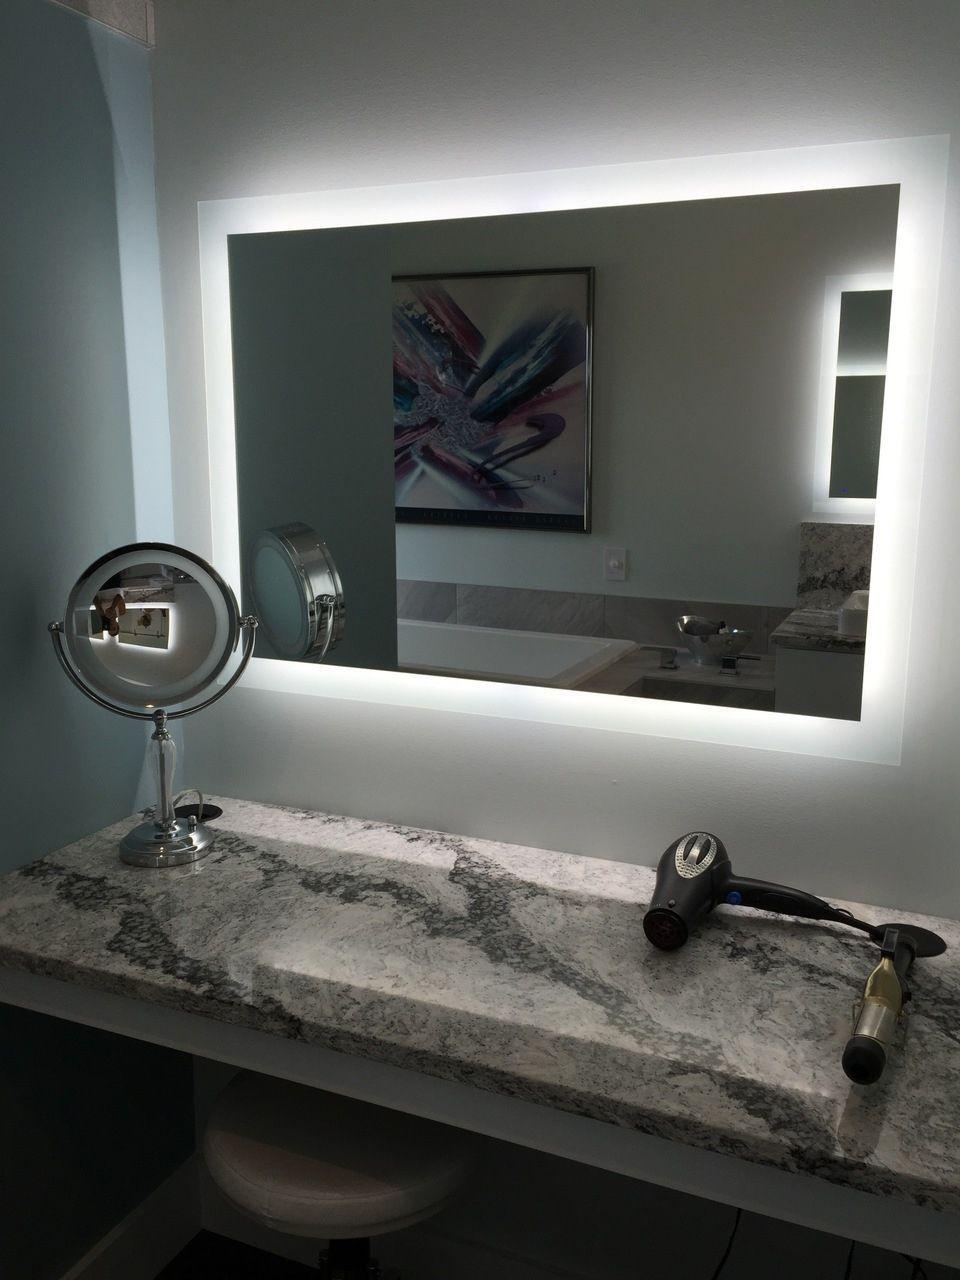 10 Budget Friendly Diy Vanity Mirror Ideas Vanity Mirror With Led Lights Bathroom Small Simple Frame Diy Vanity Mirror Diy Vanity Mirror With Led Lights